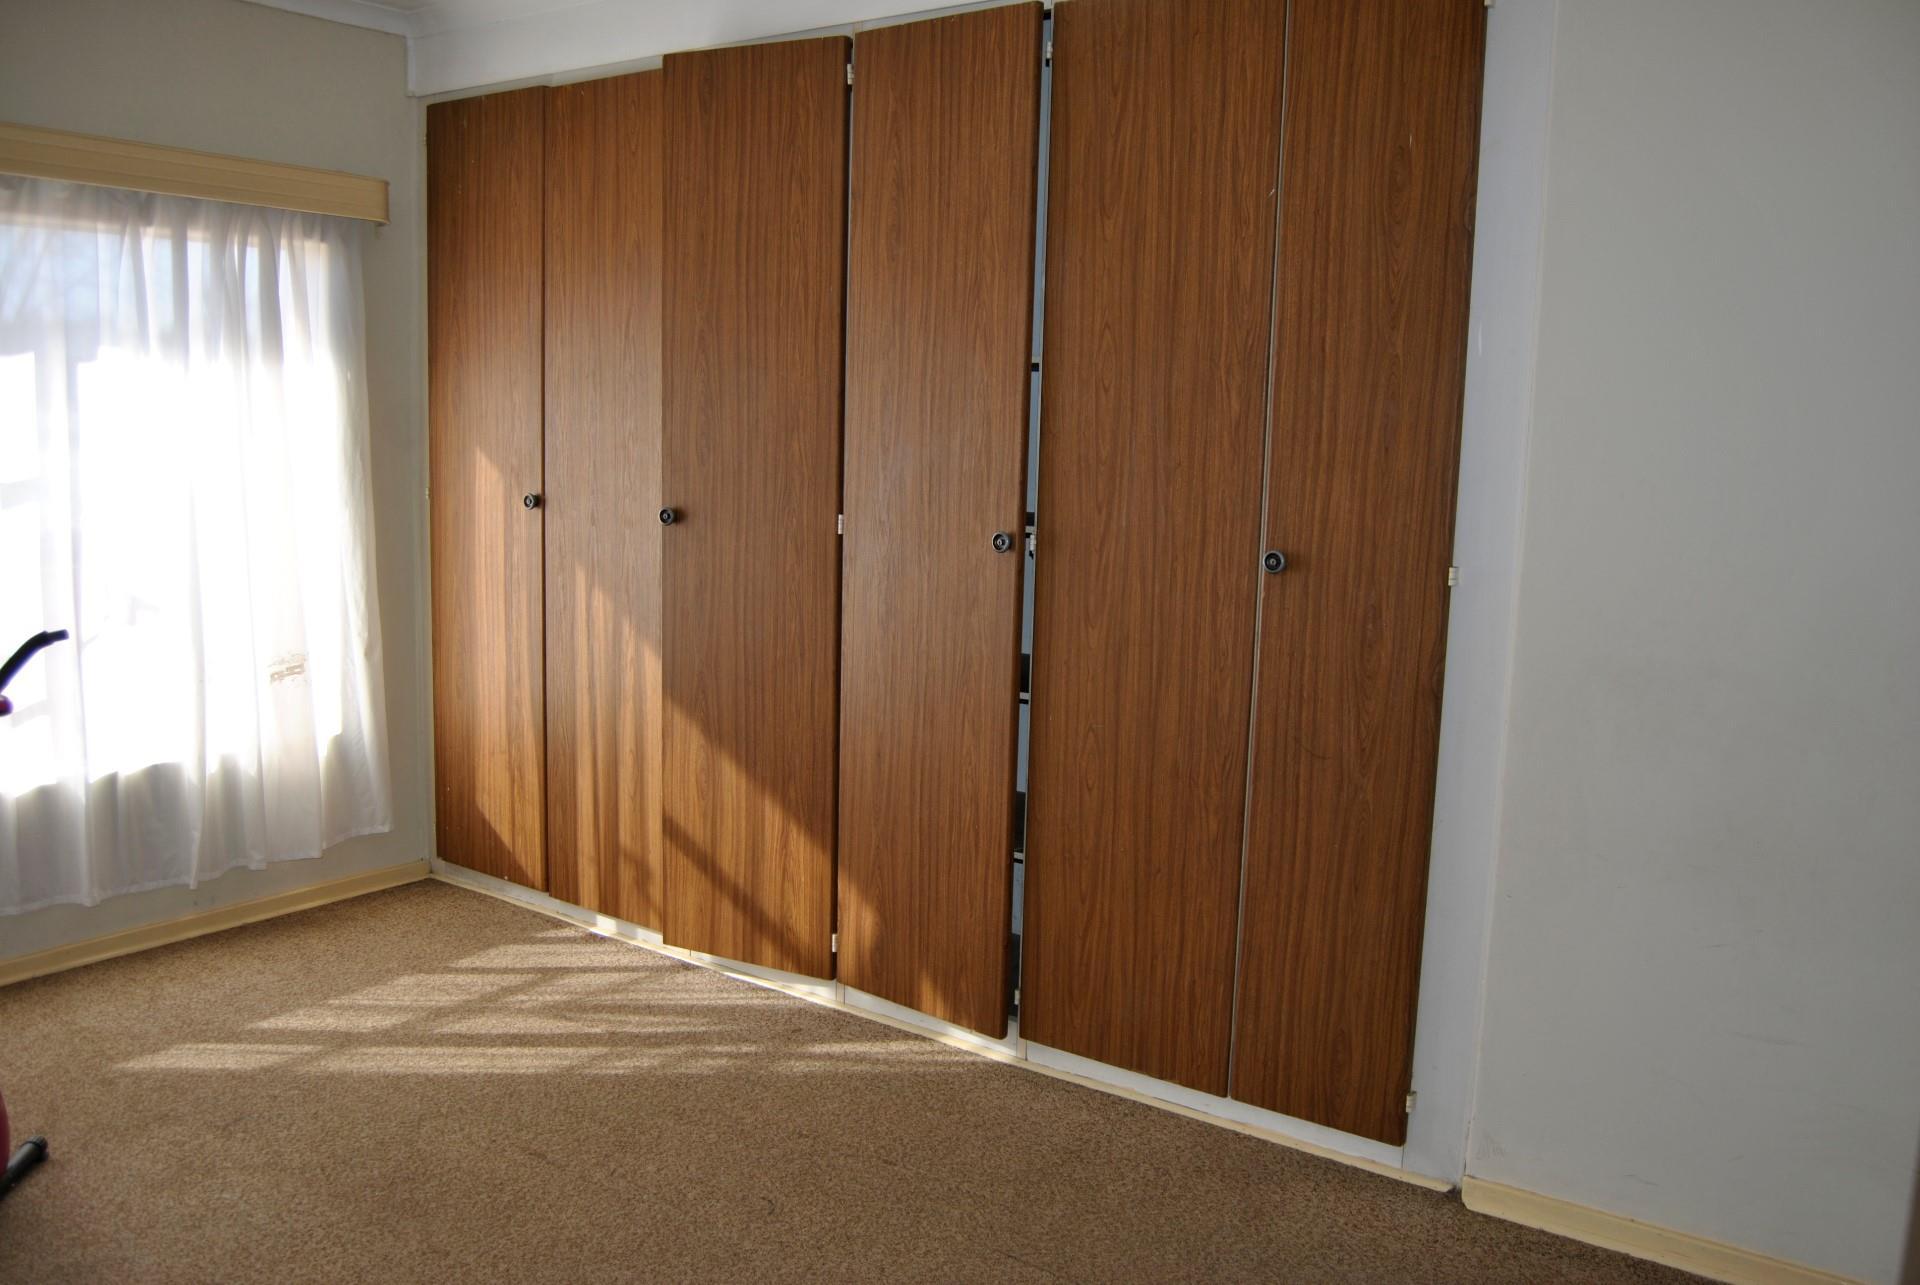 2 Bedroom Apartment / Flat For Sale in Bethlehem Central